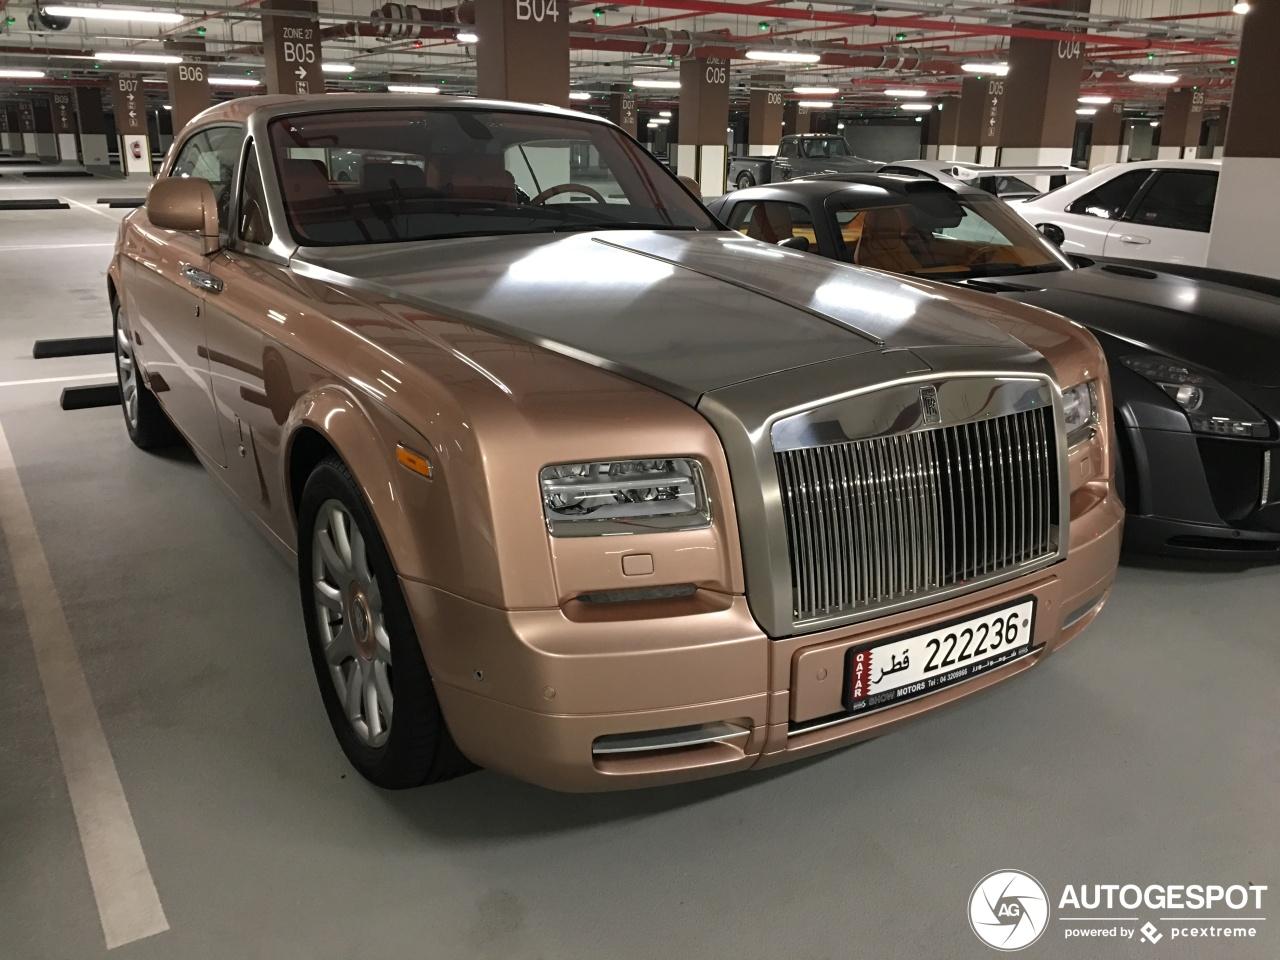 Rolls-Royce Phantom Coupé Series II - 17 April 2019 ...